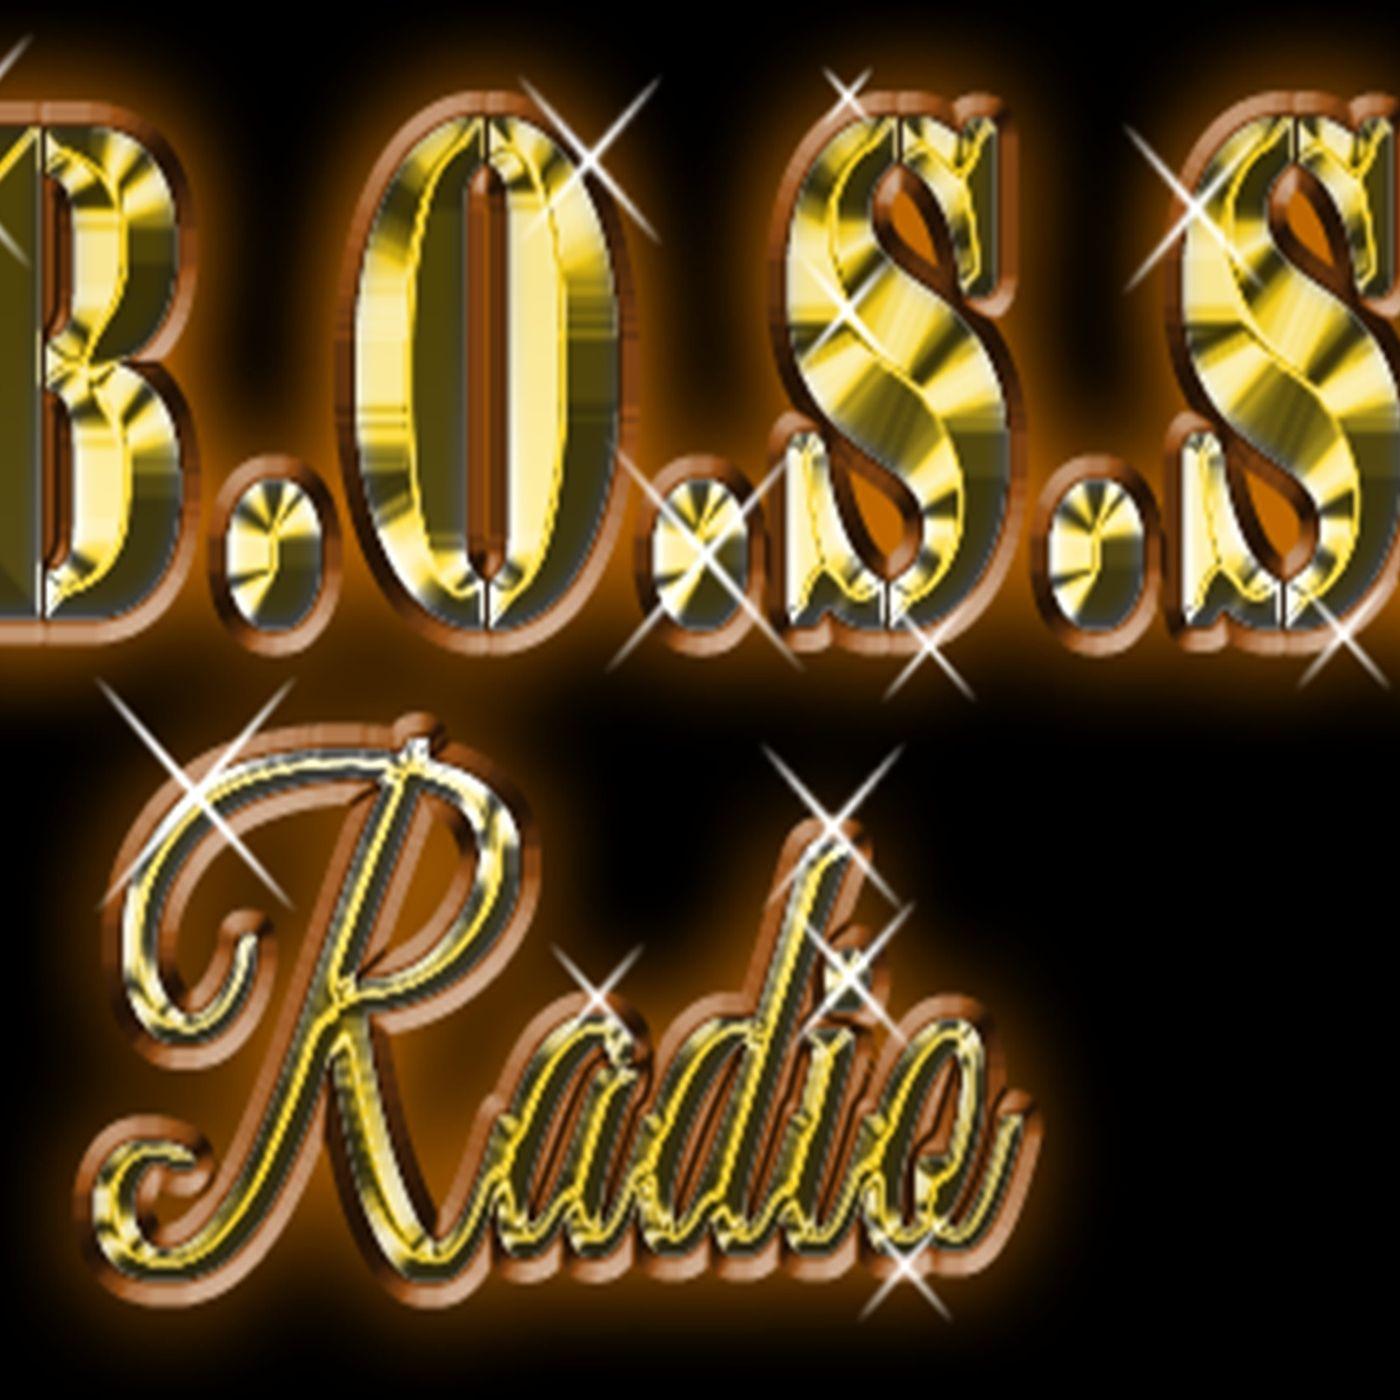 Bosses Radio